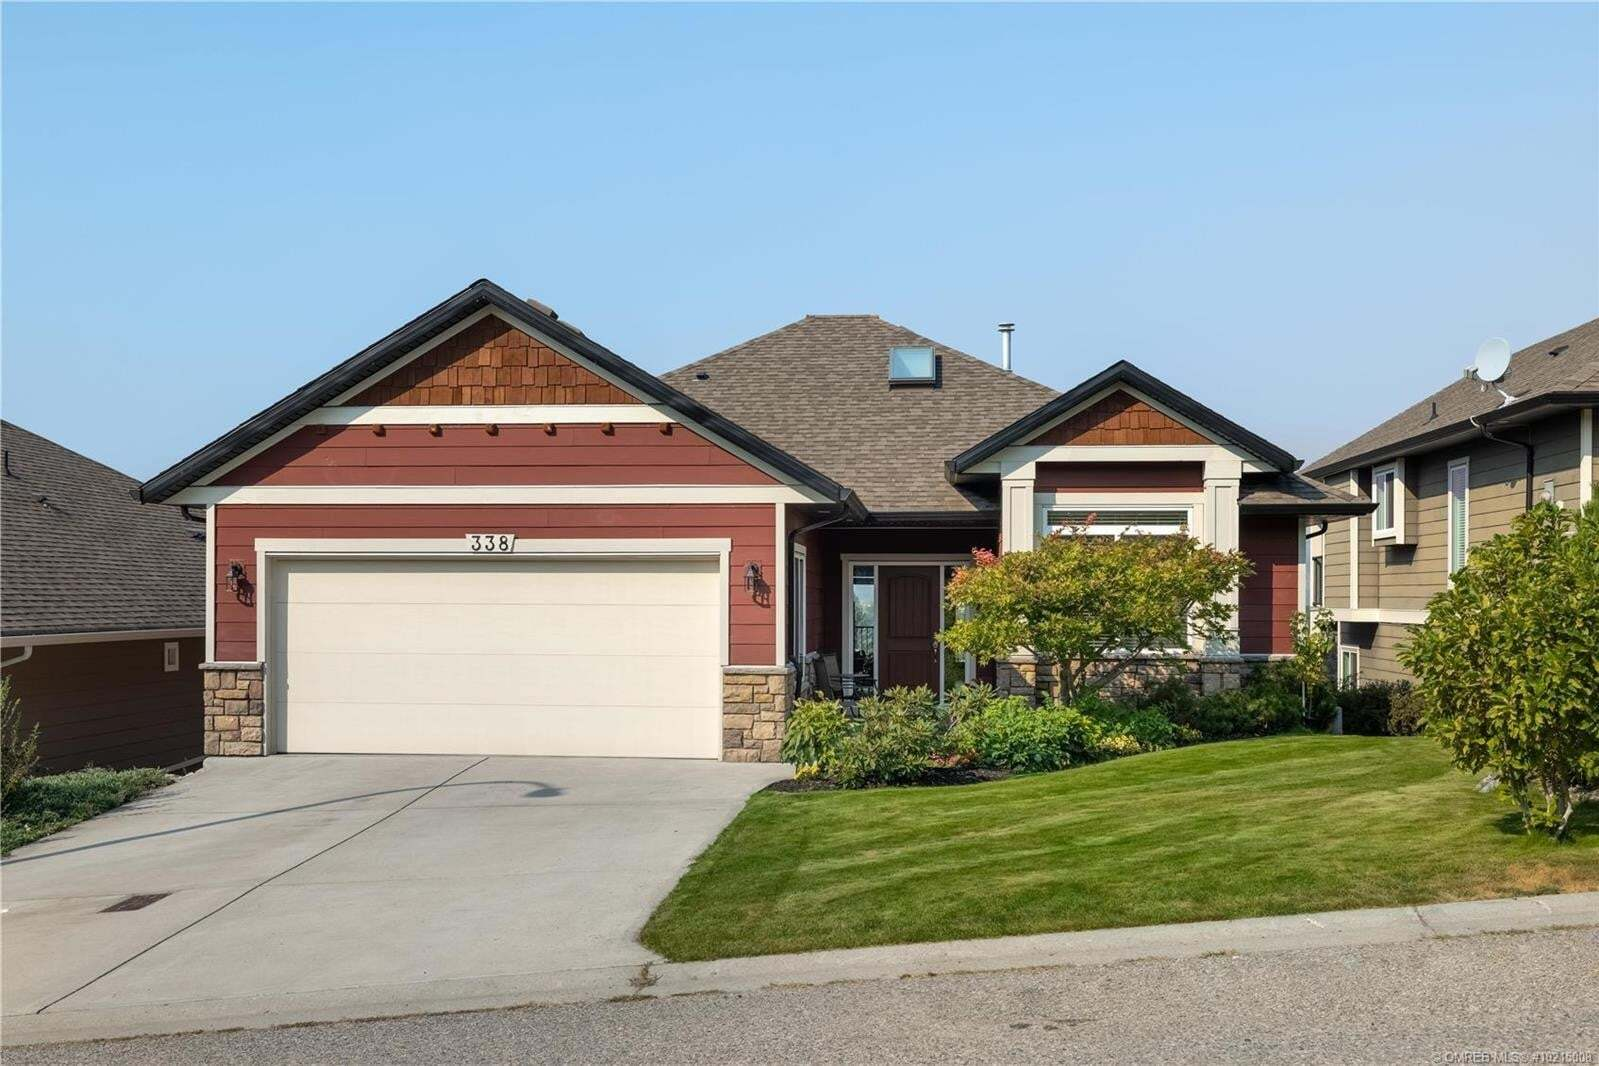 House for sale at 338 Downton Ct Kelowna British Columbia - MLS: 10215008